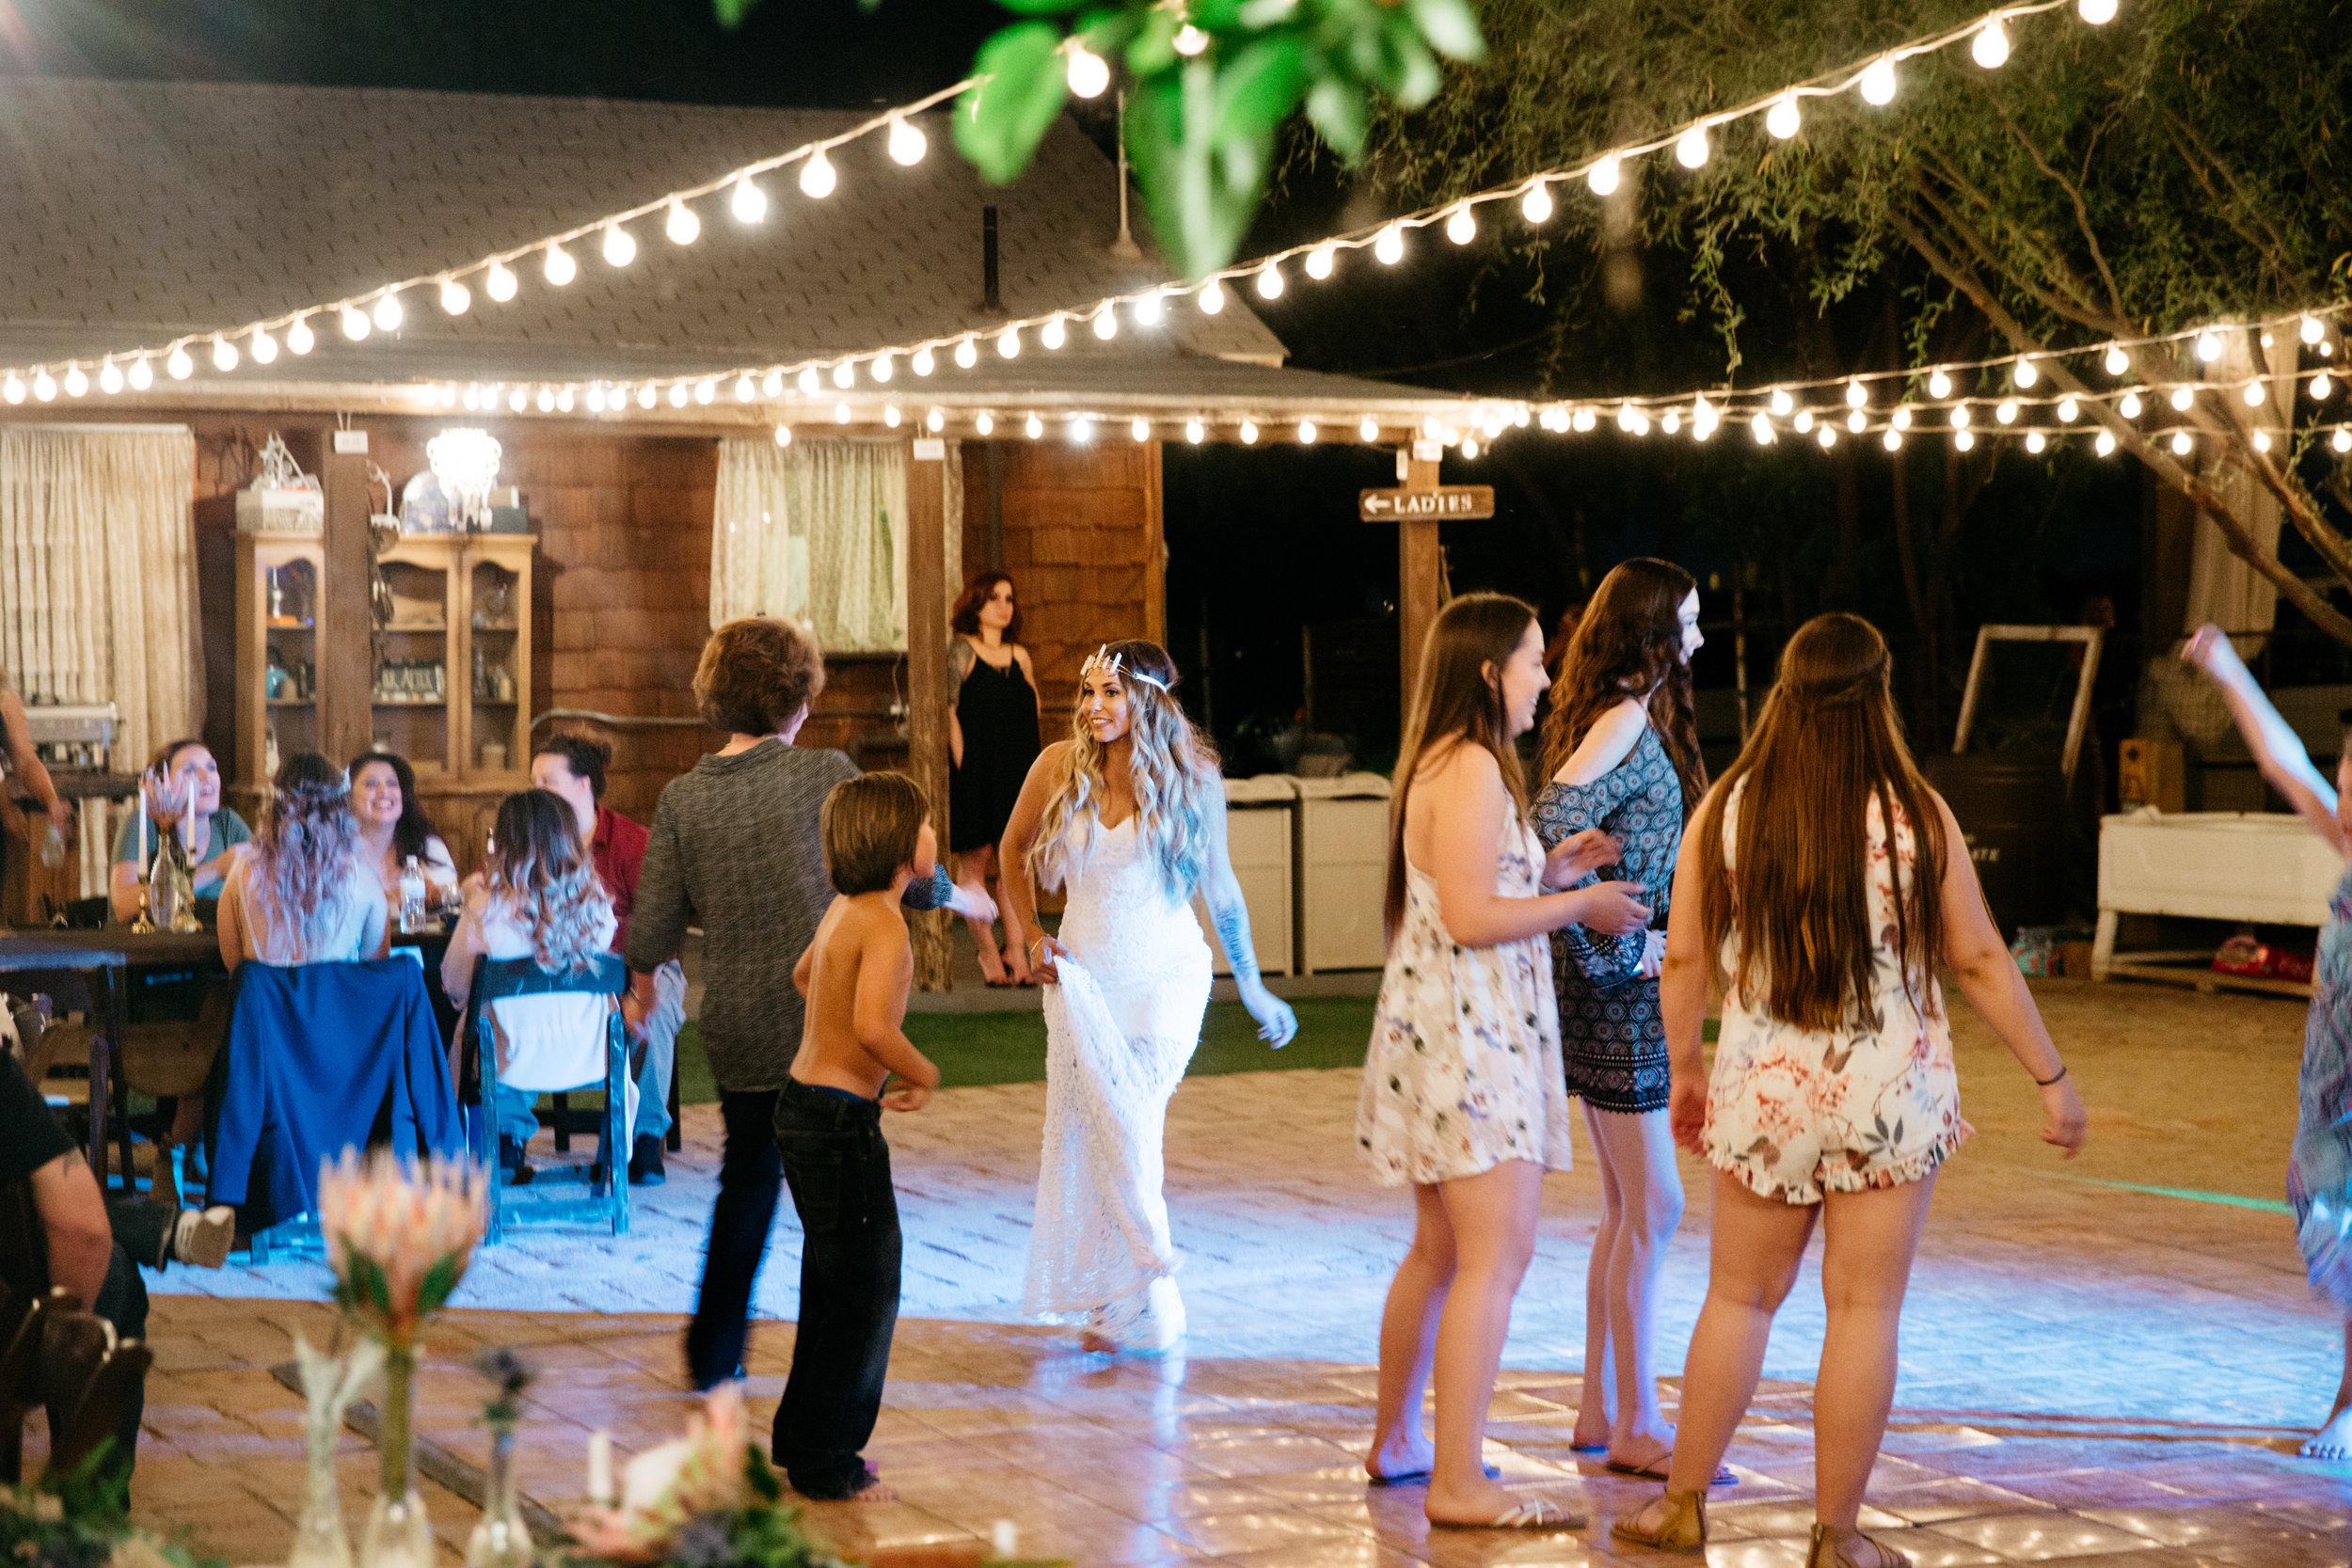 colorado-springs-wedding-photographer-49.jpg